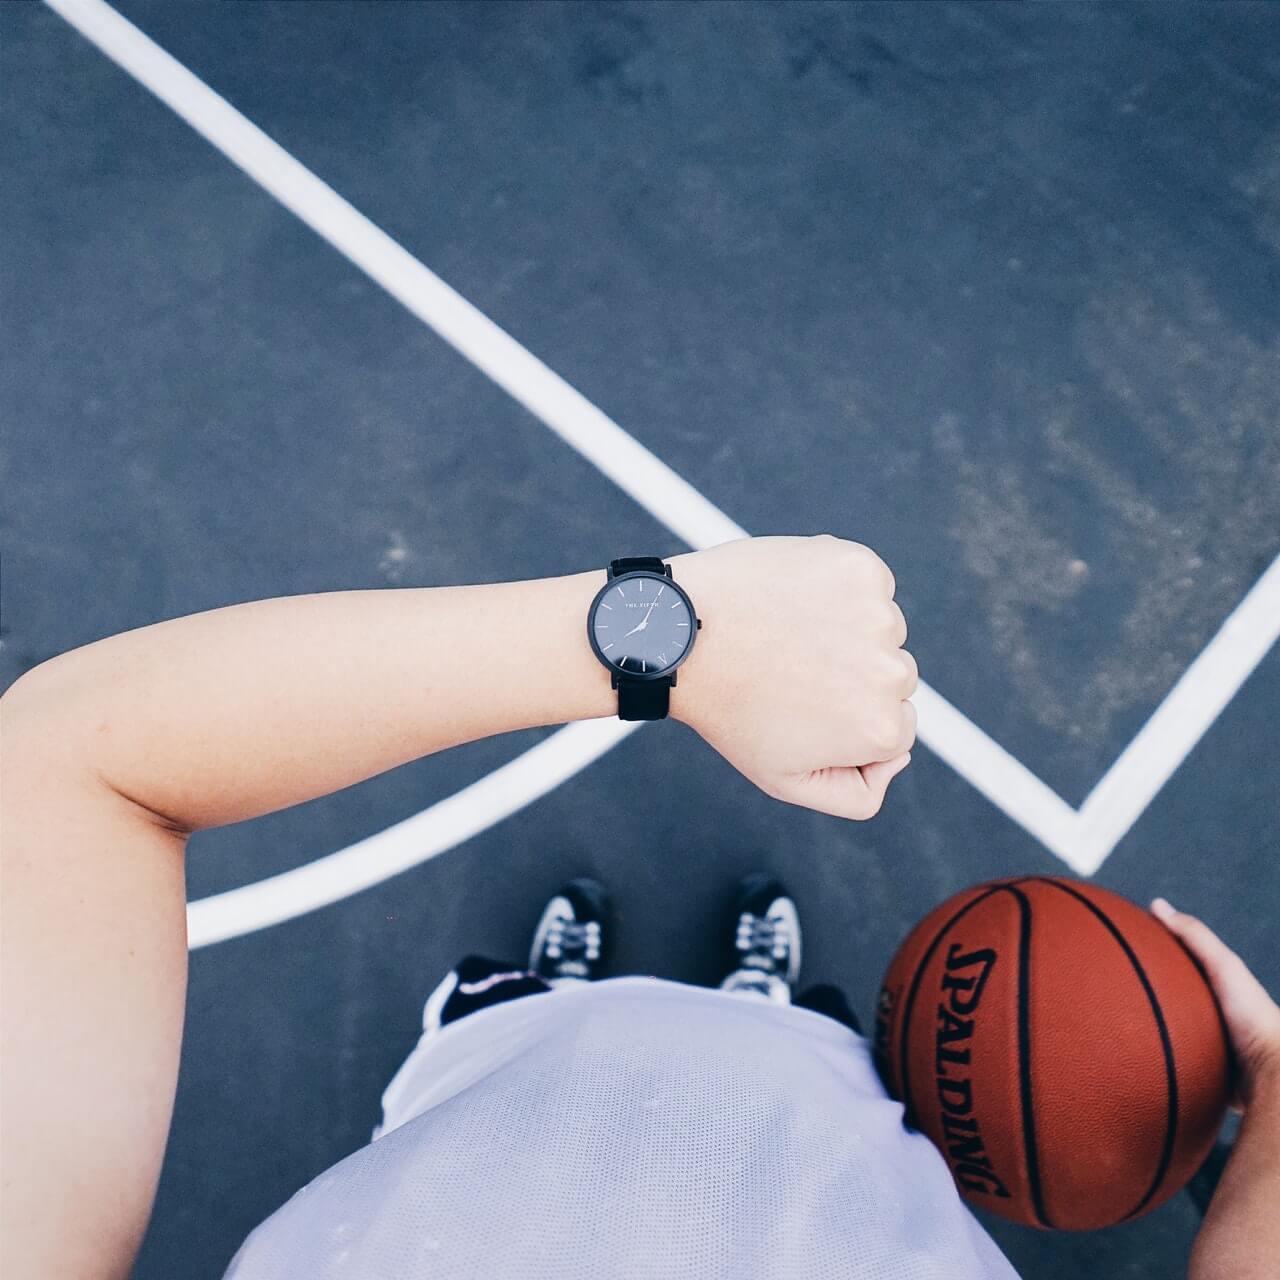 Zegarek-meski-pilka-od-koszykowki-na-tle-boiska